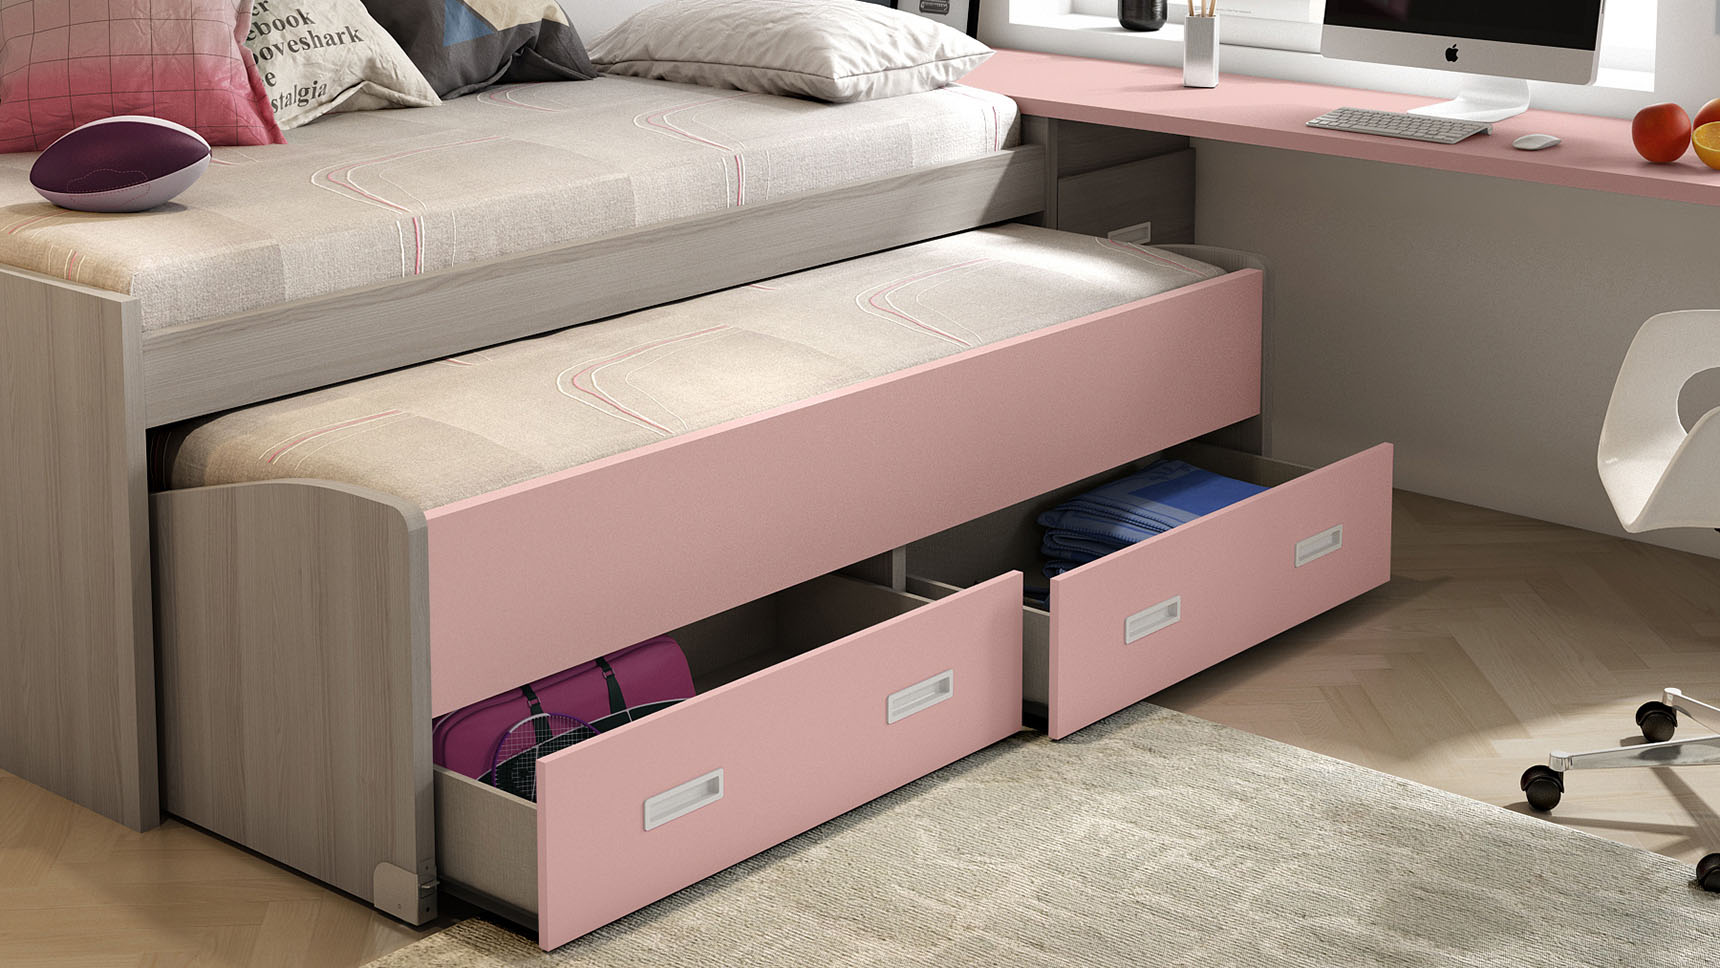 cama compacto ih086